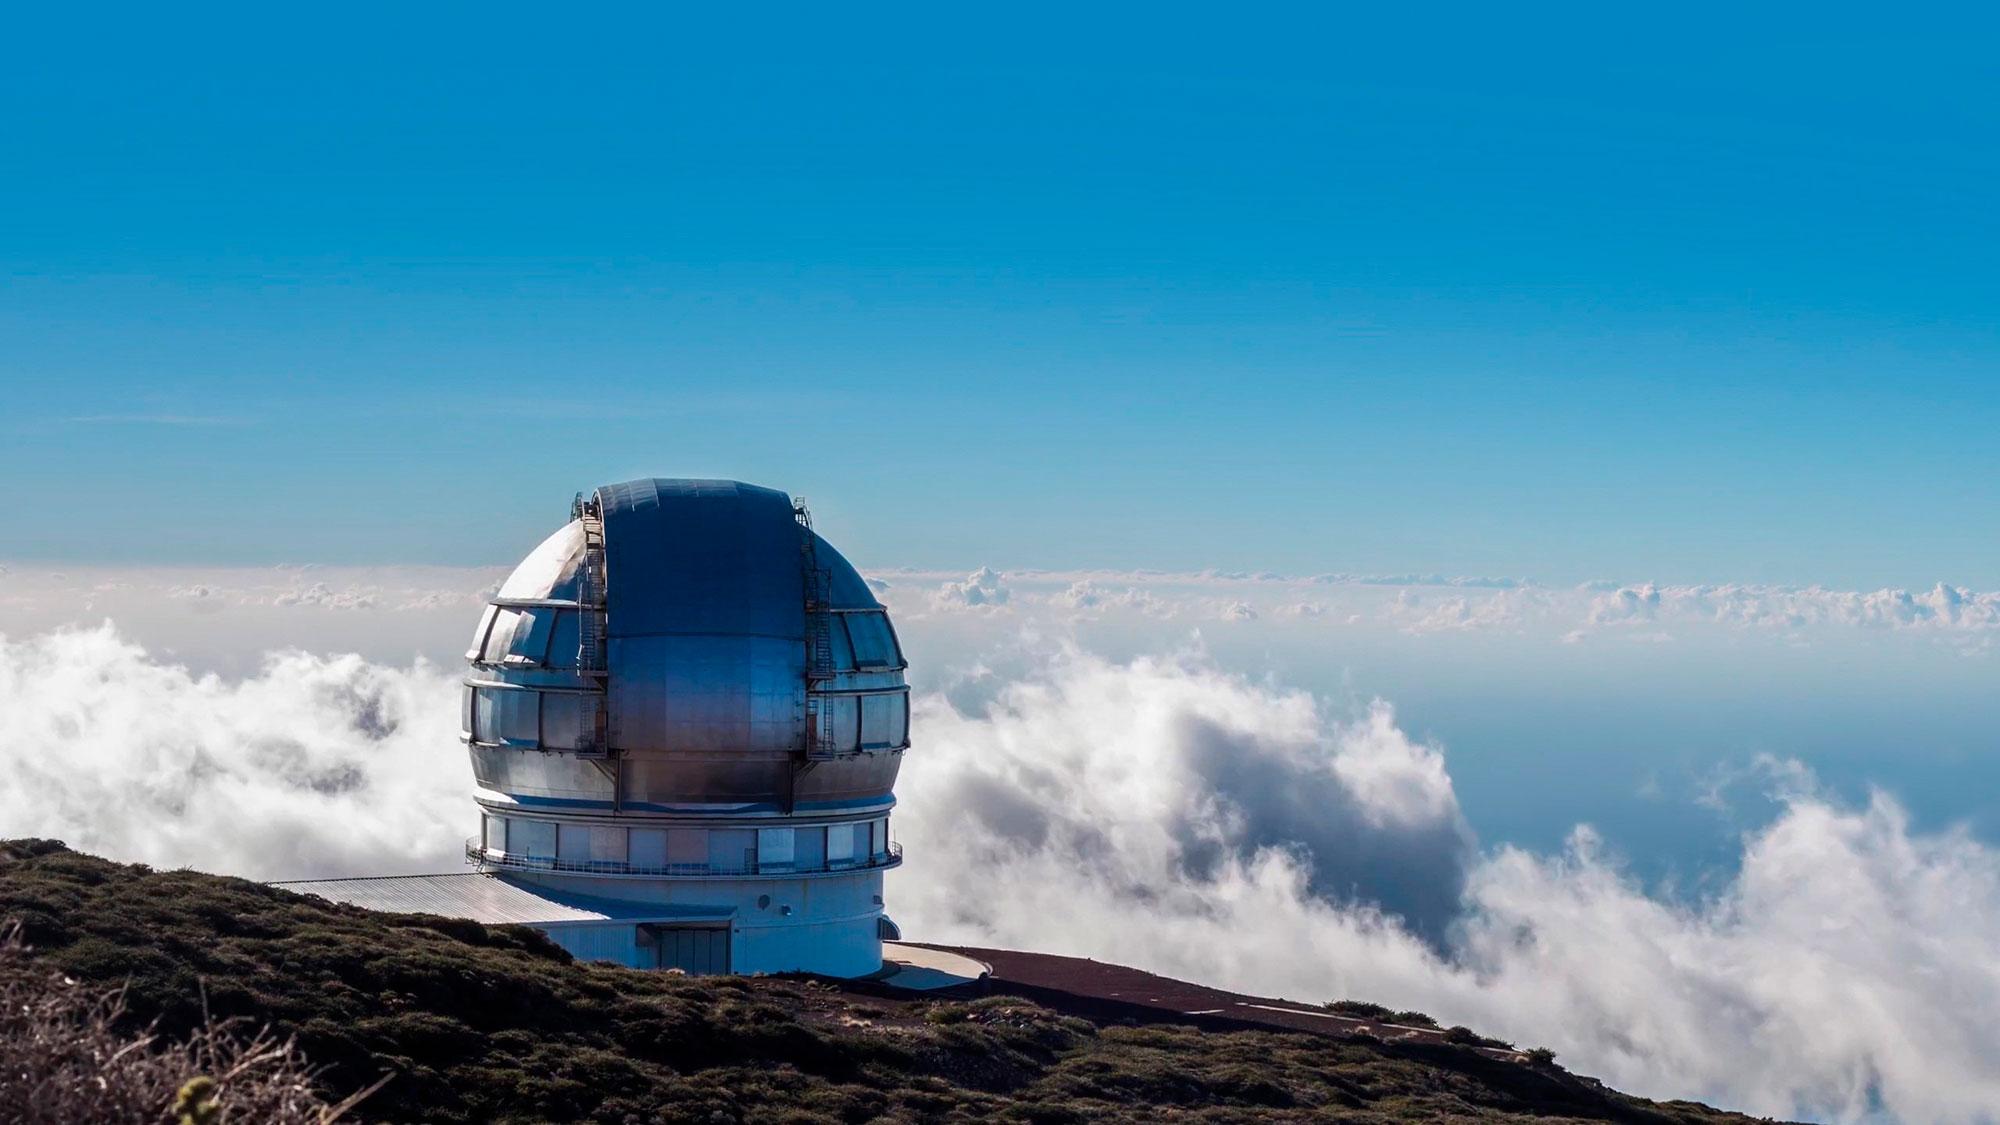 Naturaleza mágica, paisajes increibles, Islas Canarias - España- imagen #3